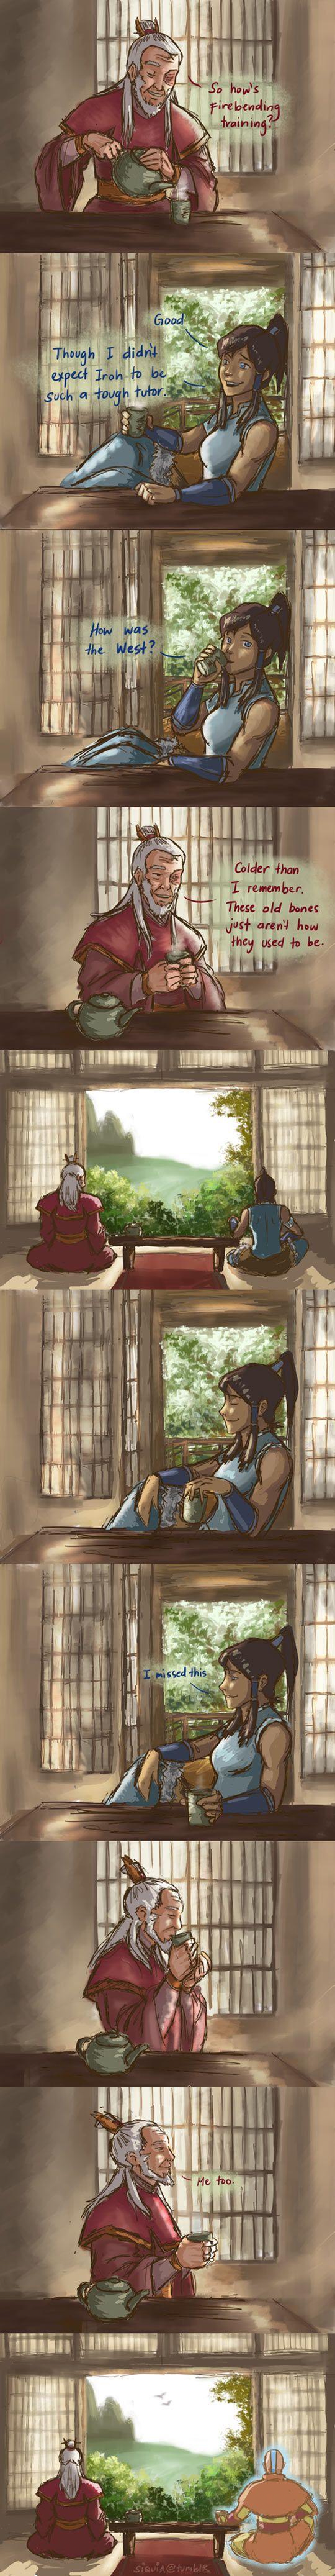 Aang & Zuko. So sweet and sad.